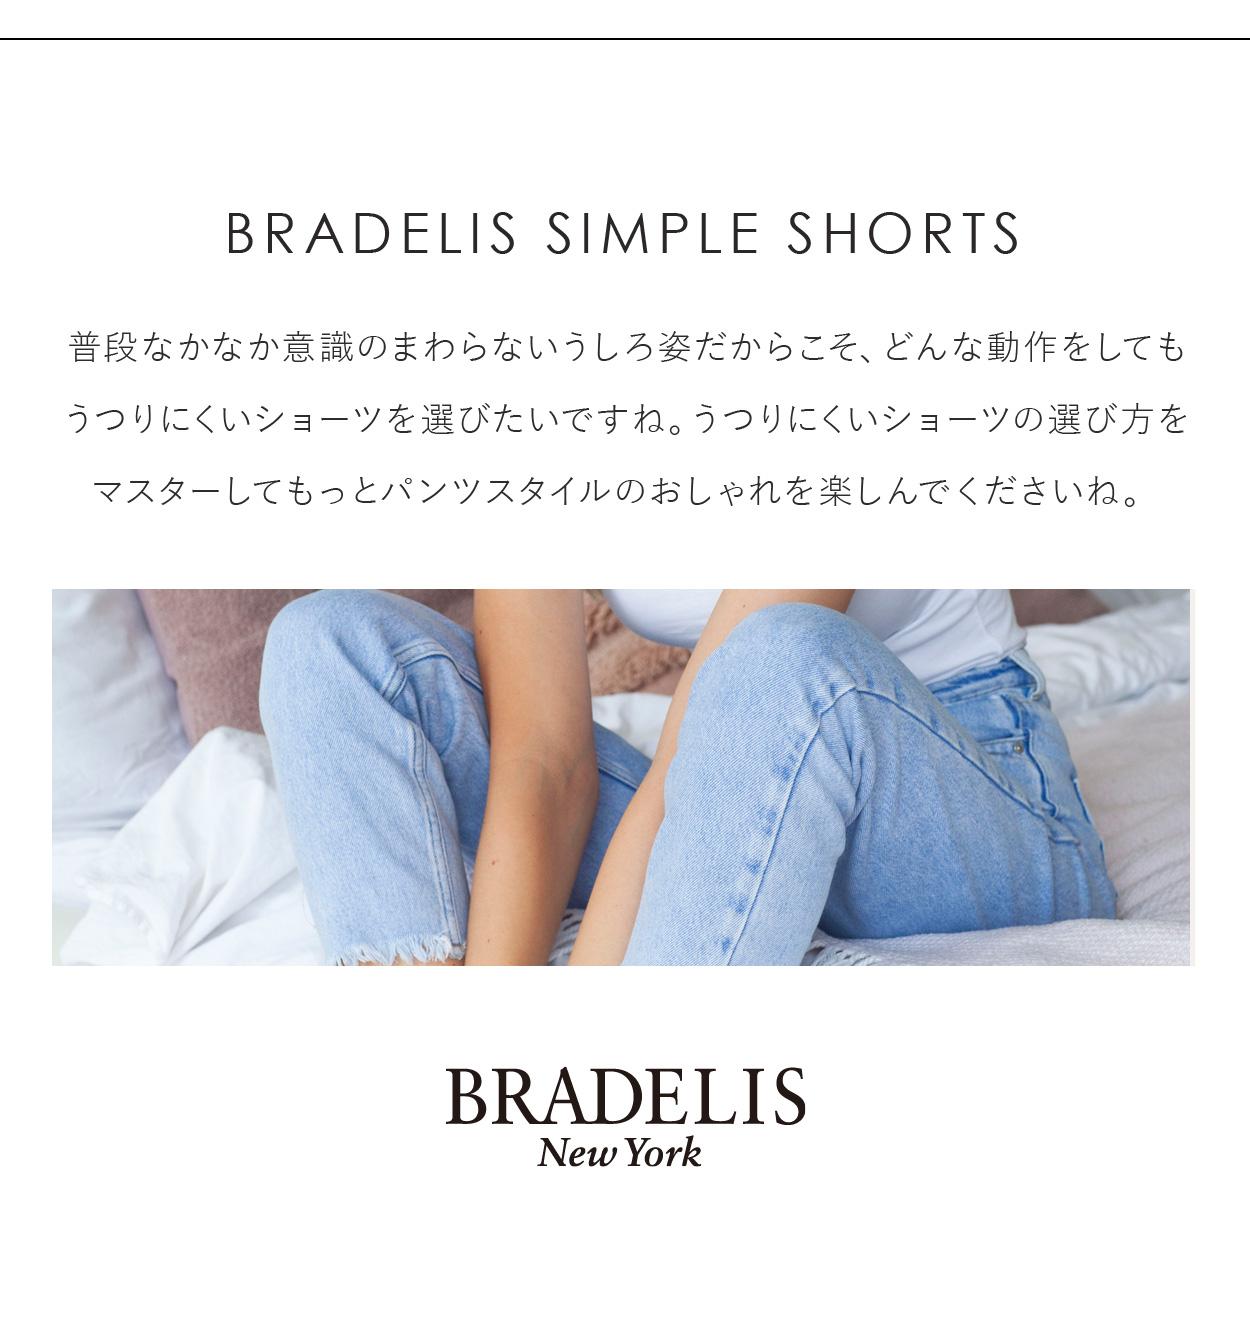 BRADELIS SIMPLE SHORTS